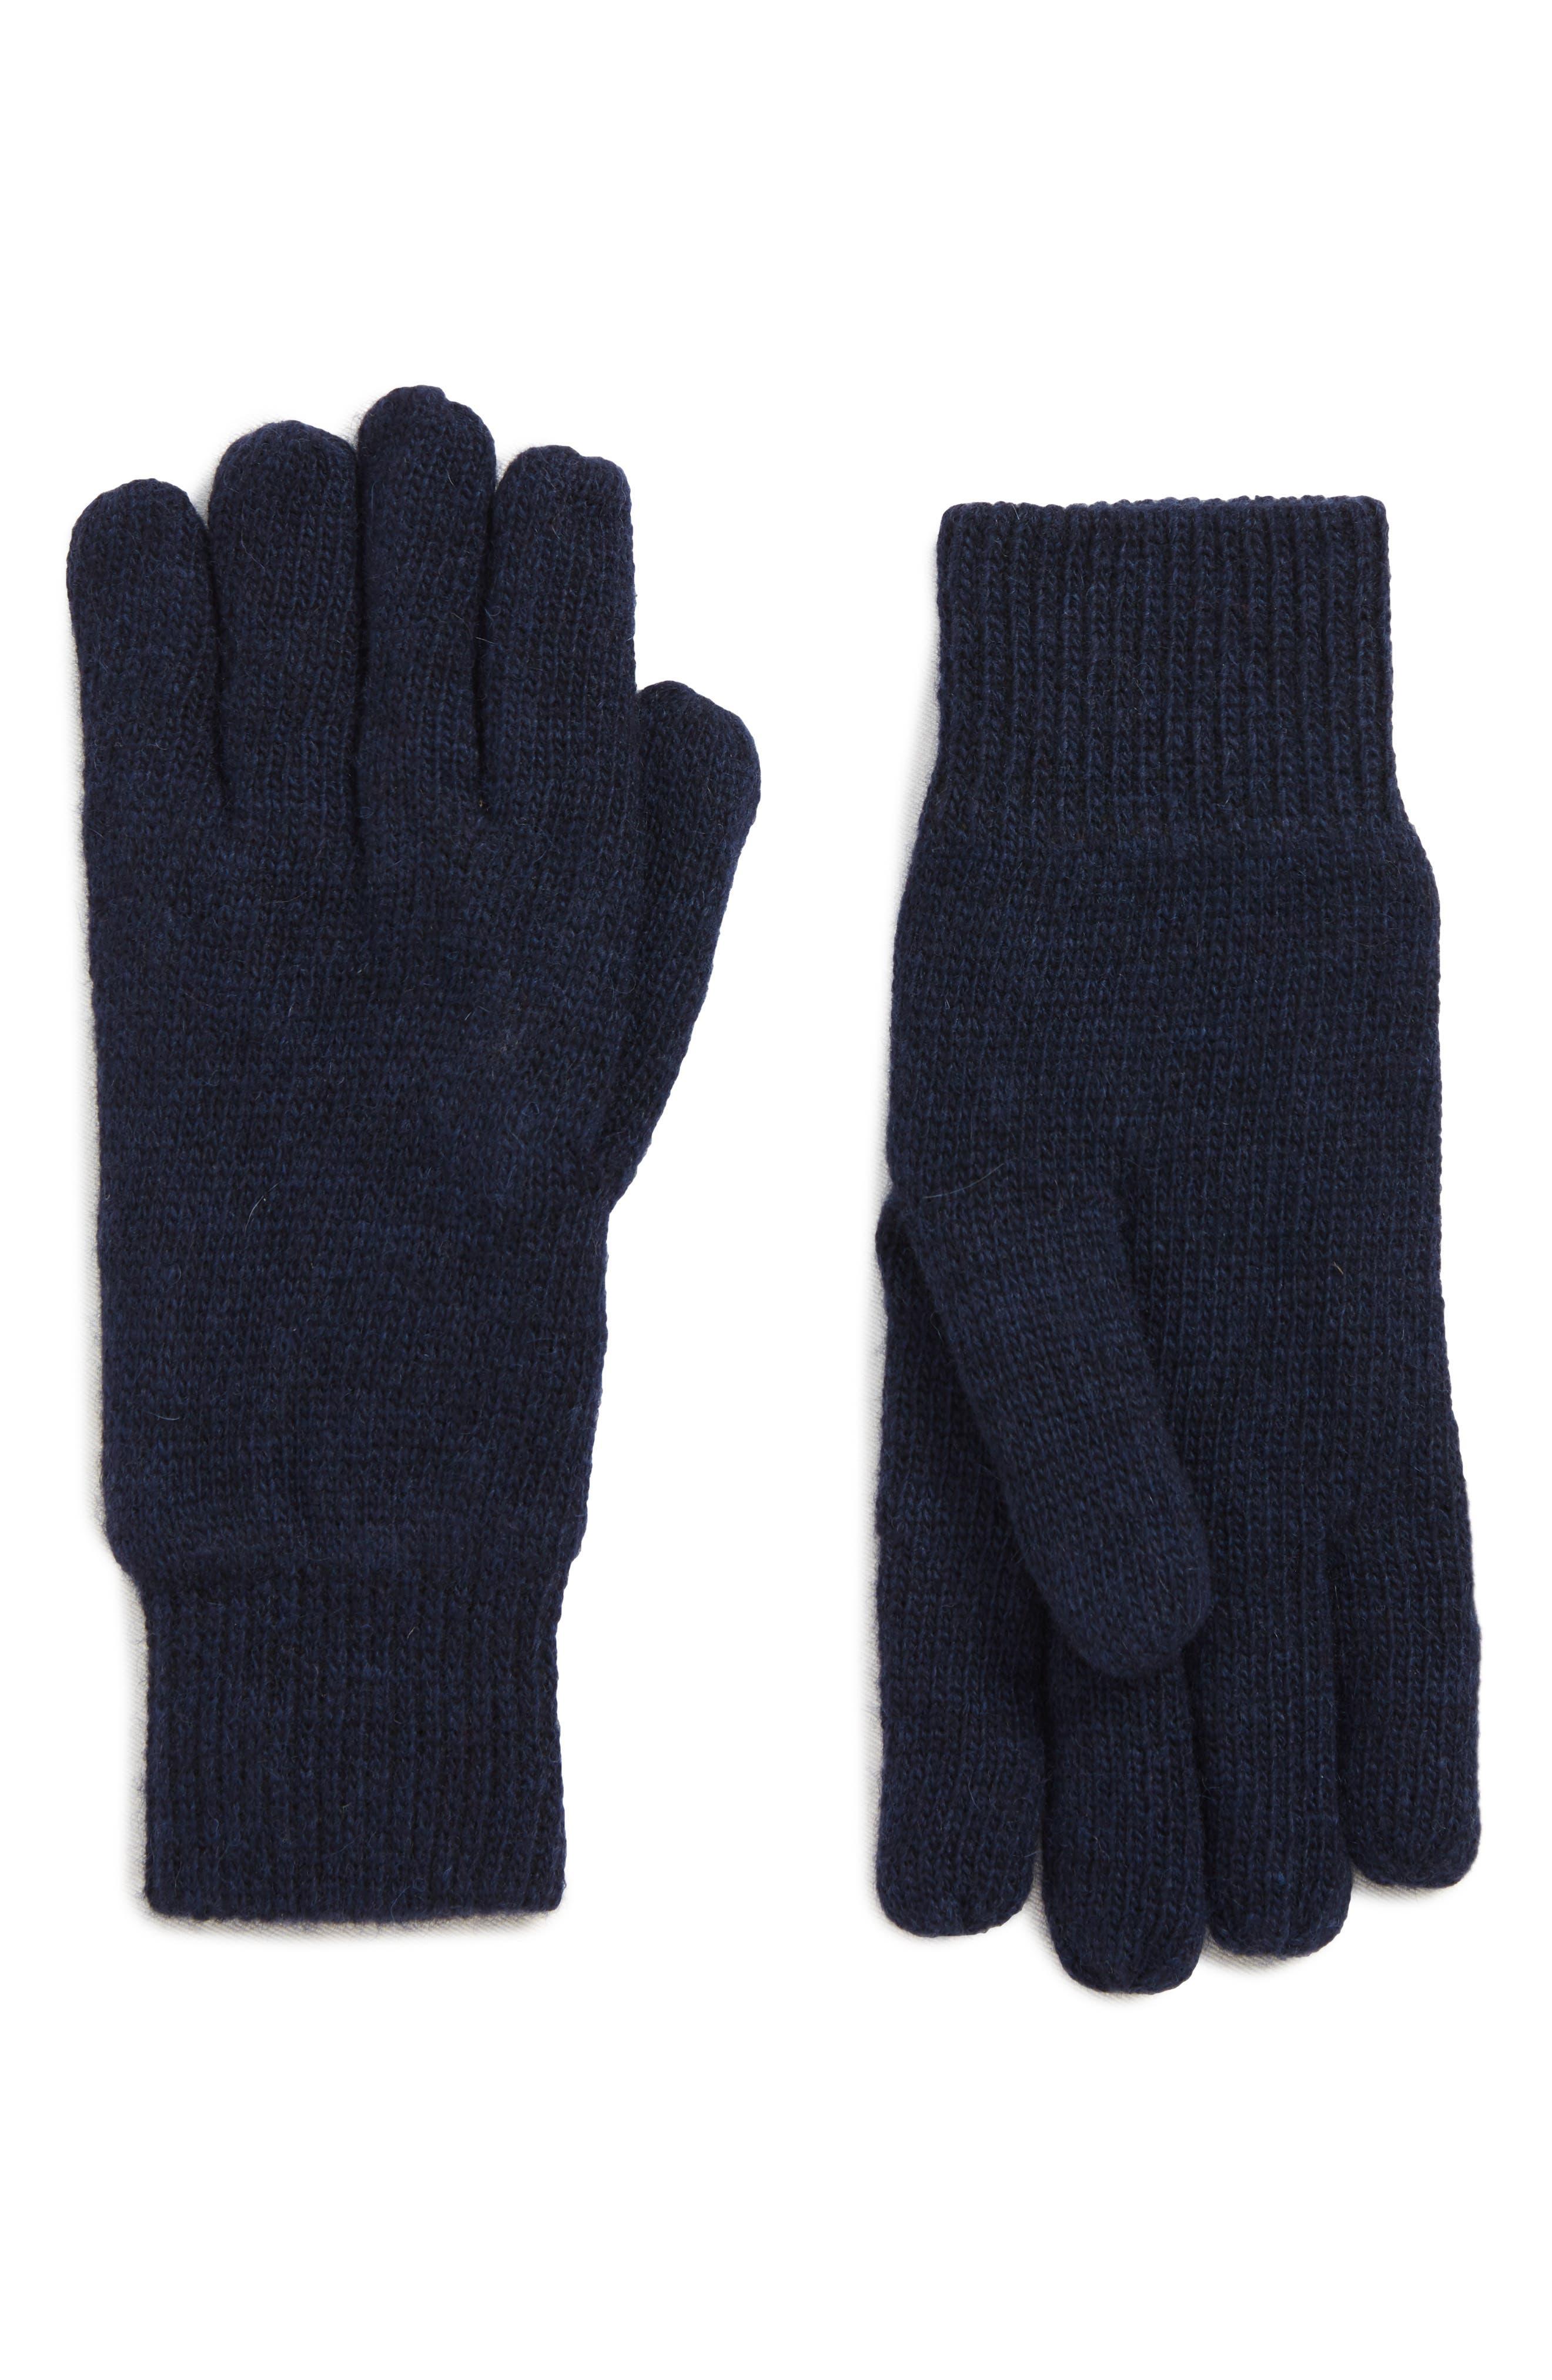 Carlton Stretch Wool Gloves,                             Main thumbnail 1, color,                             NAVY